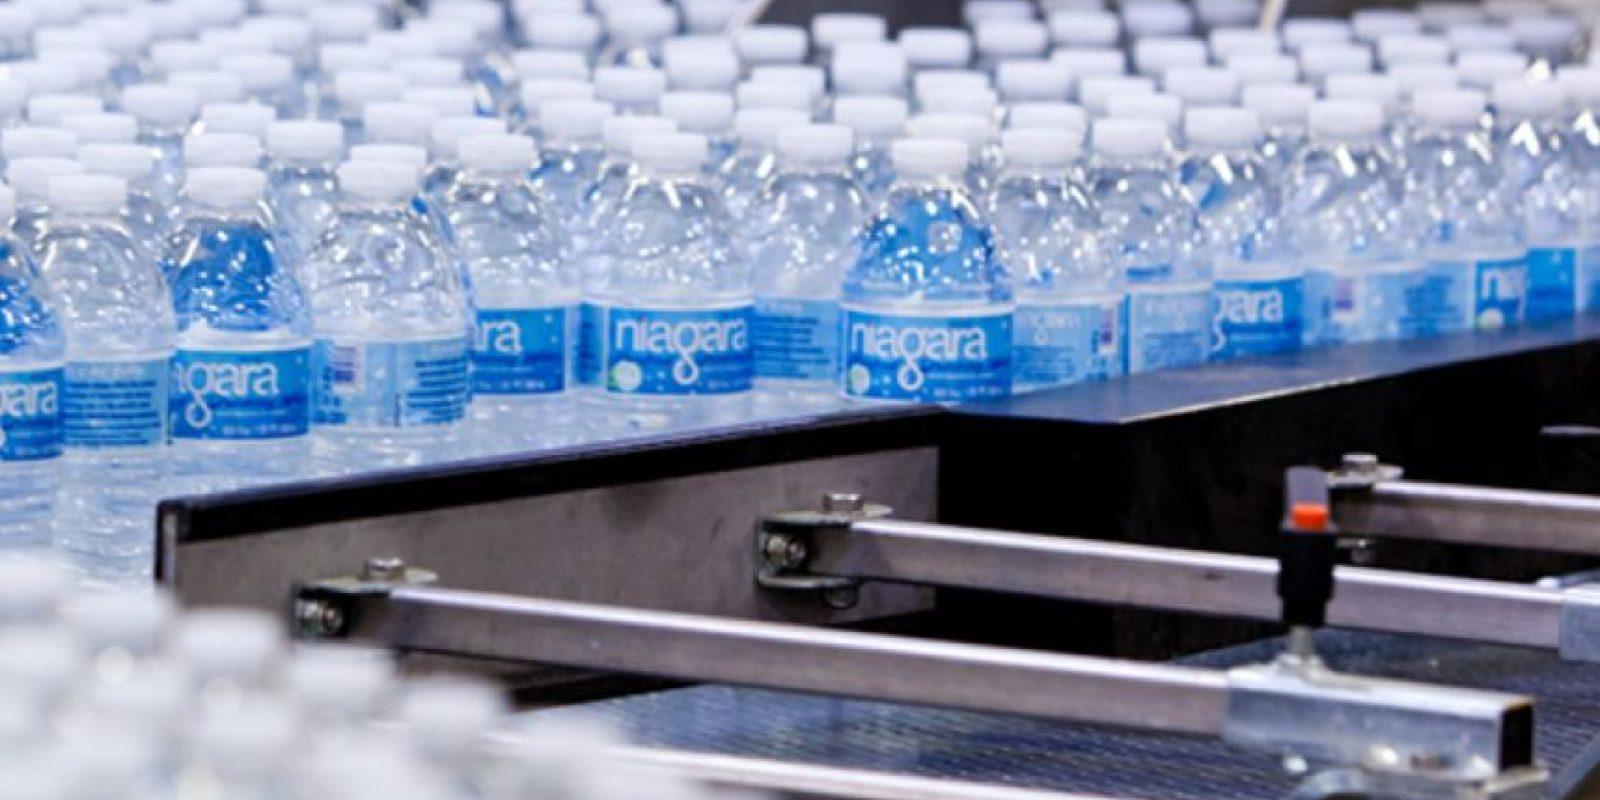 Compañía de agua potable Niagara Bottling reportó bacteria en sus productos. Foto:Vía niagarawater.com